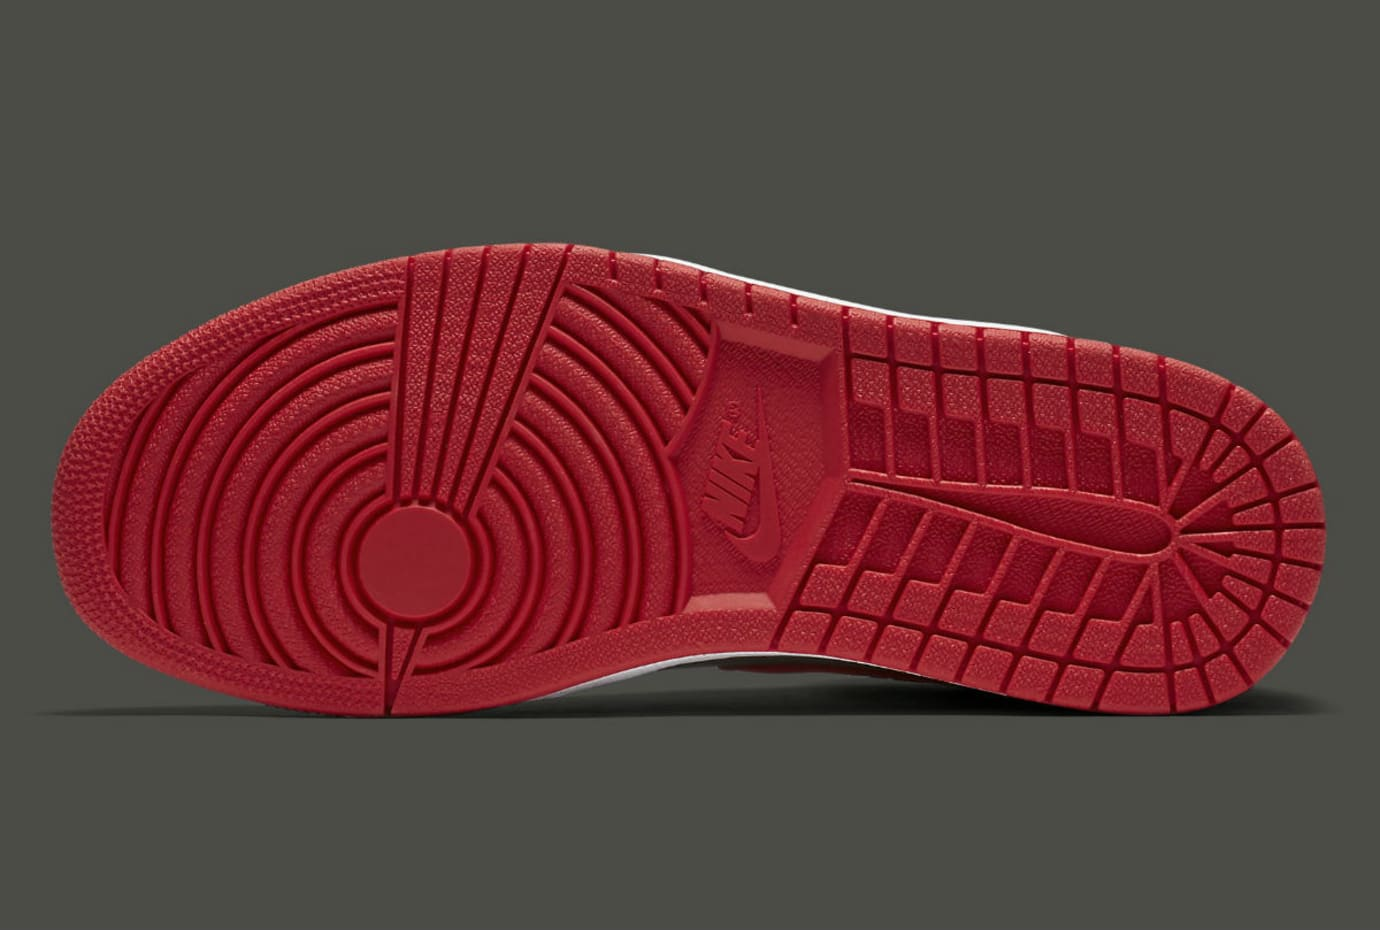 Air Jordan 1 Camo River Rock Red Release Date Sole AA3993-032